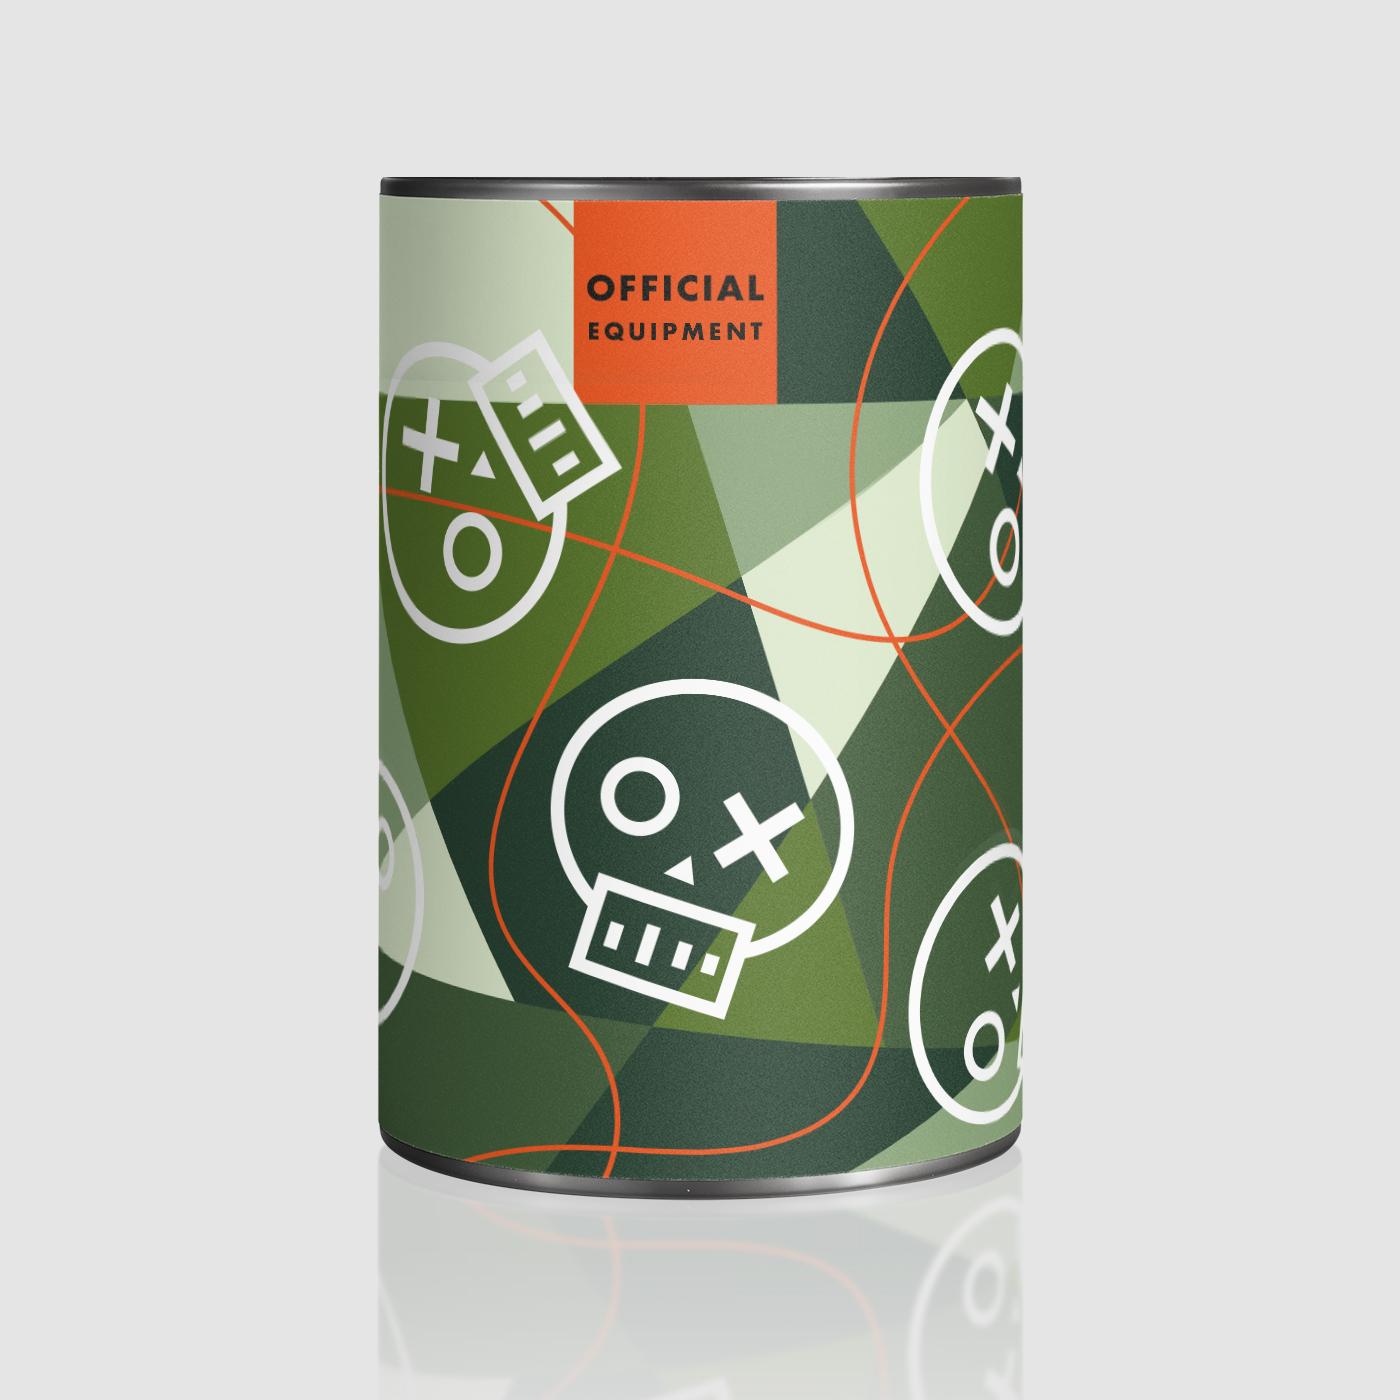 Verpackungsdesign